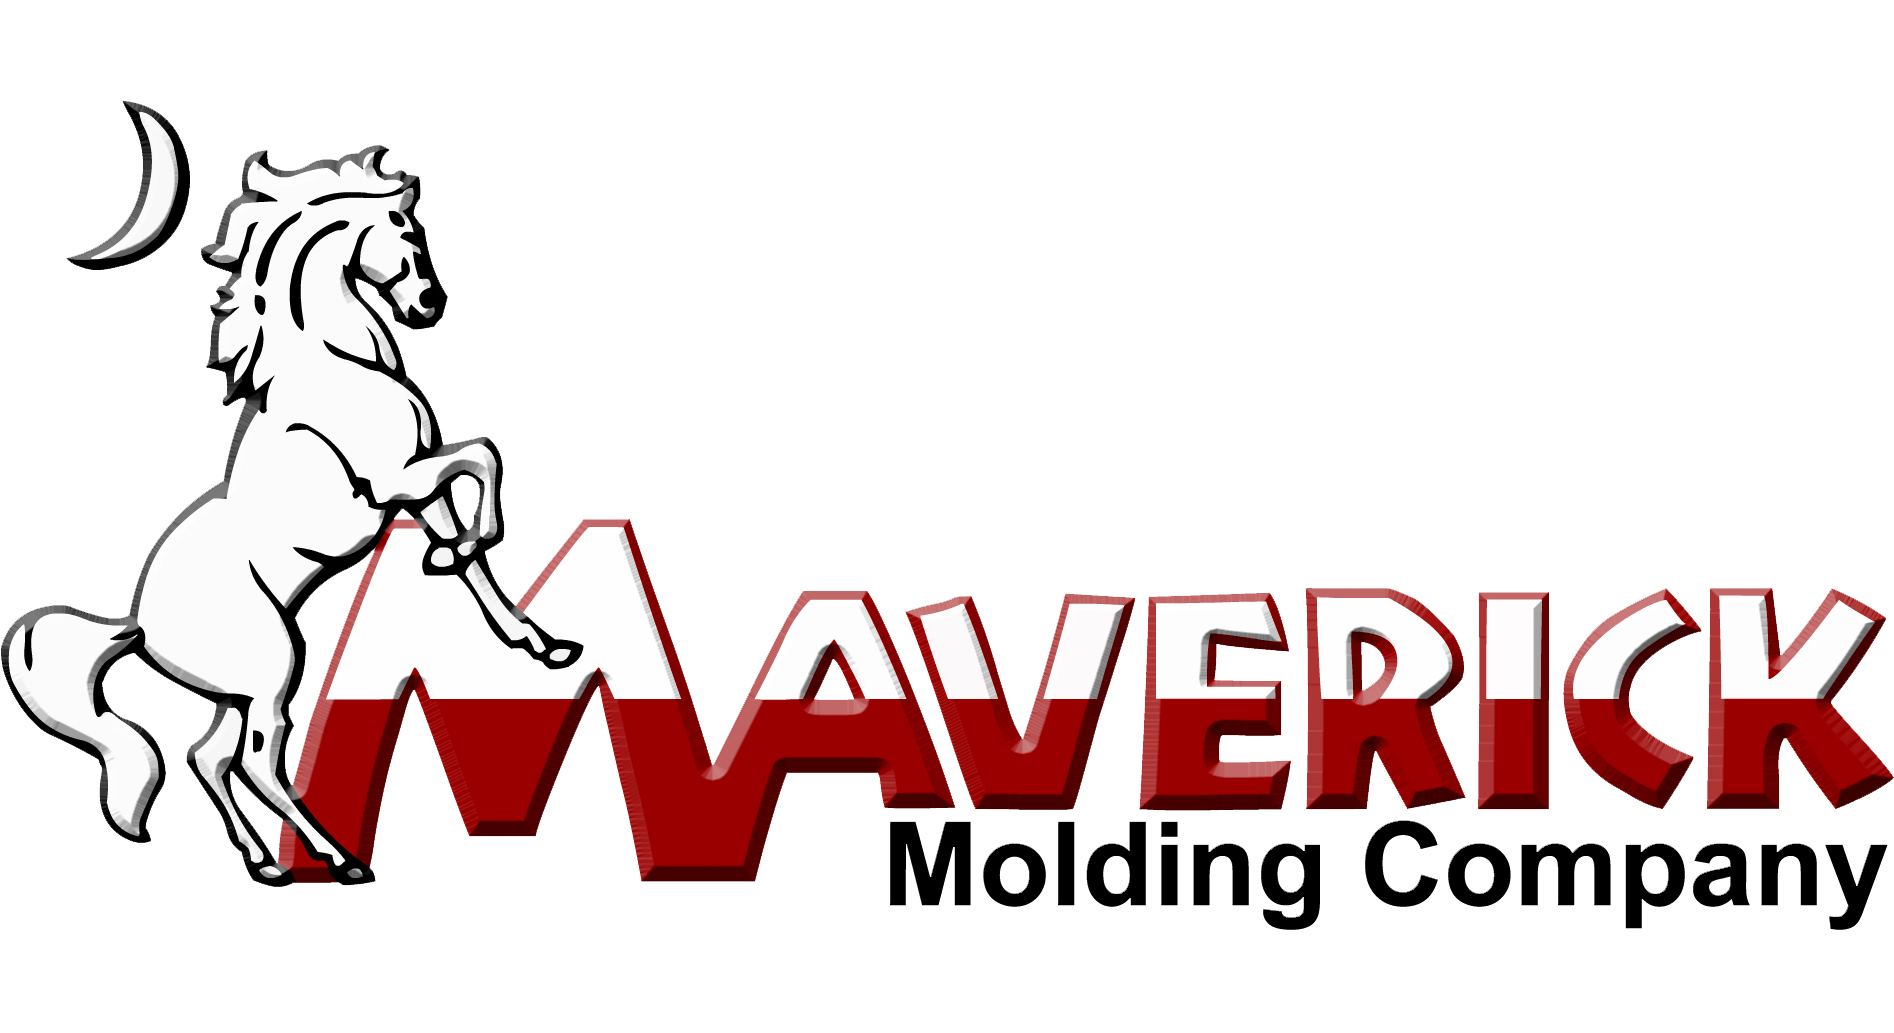 Maverick Molding